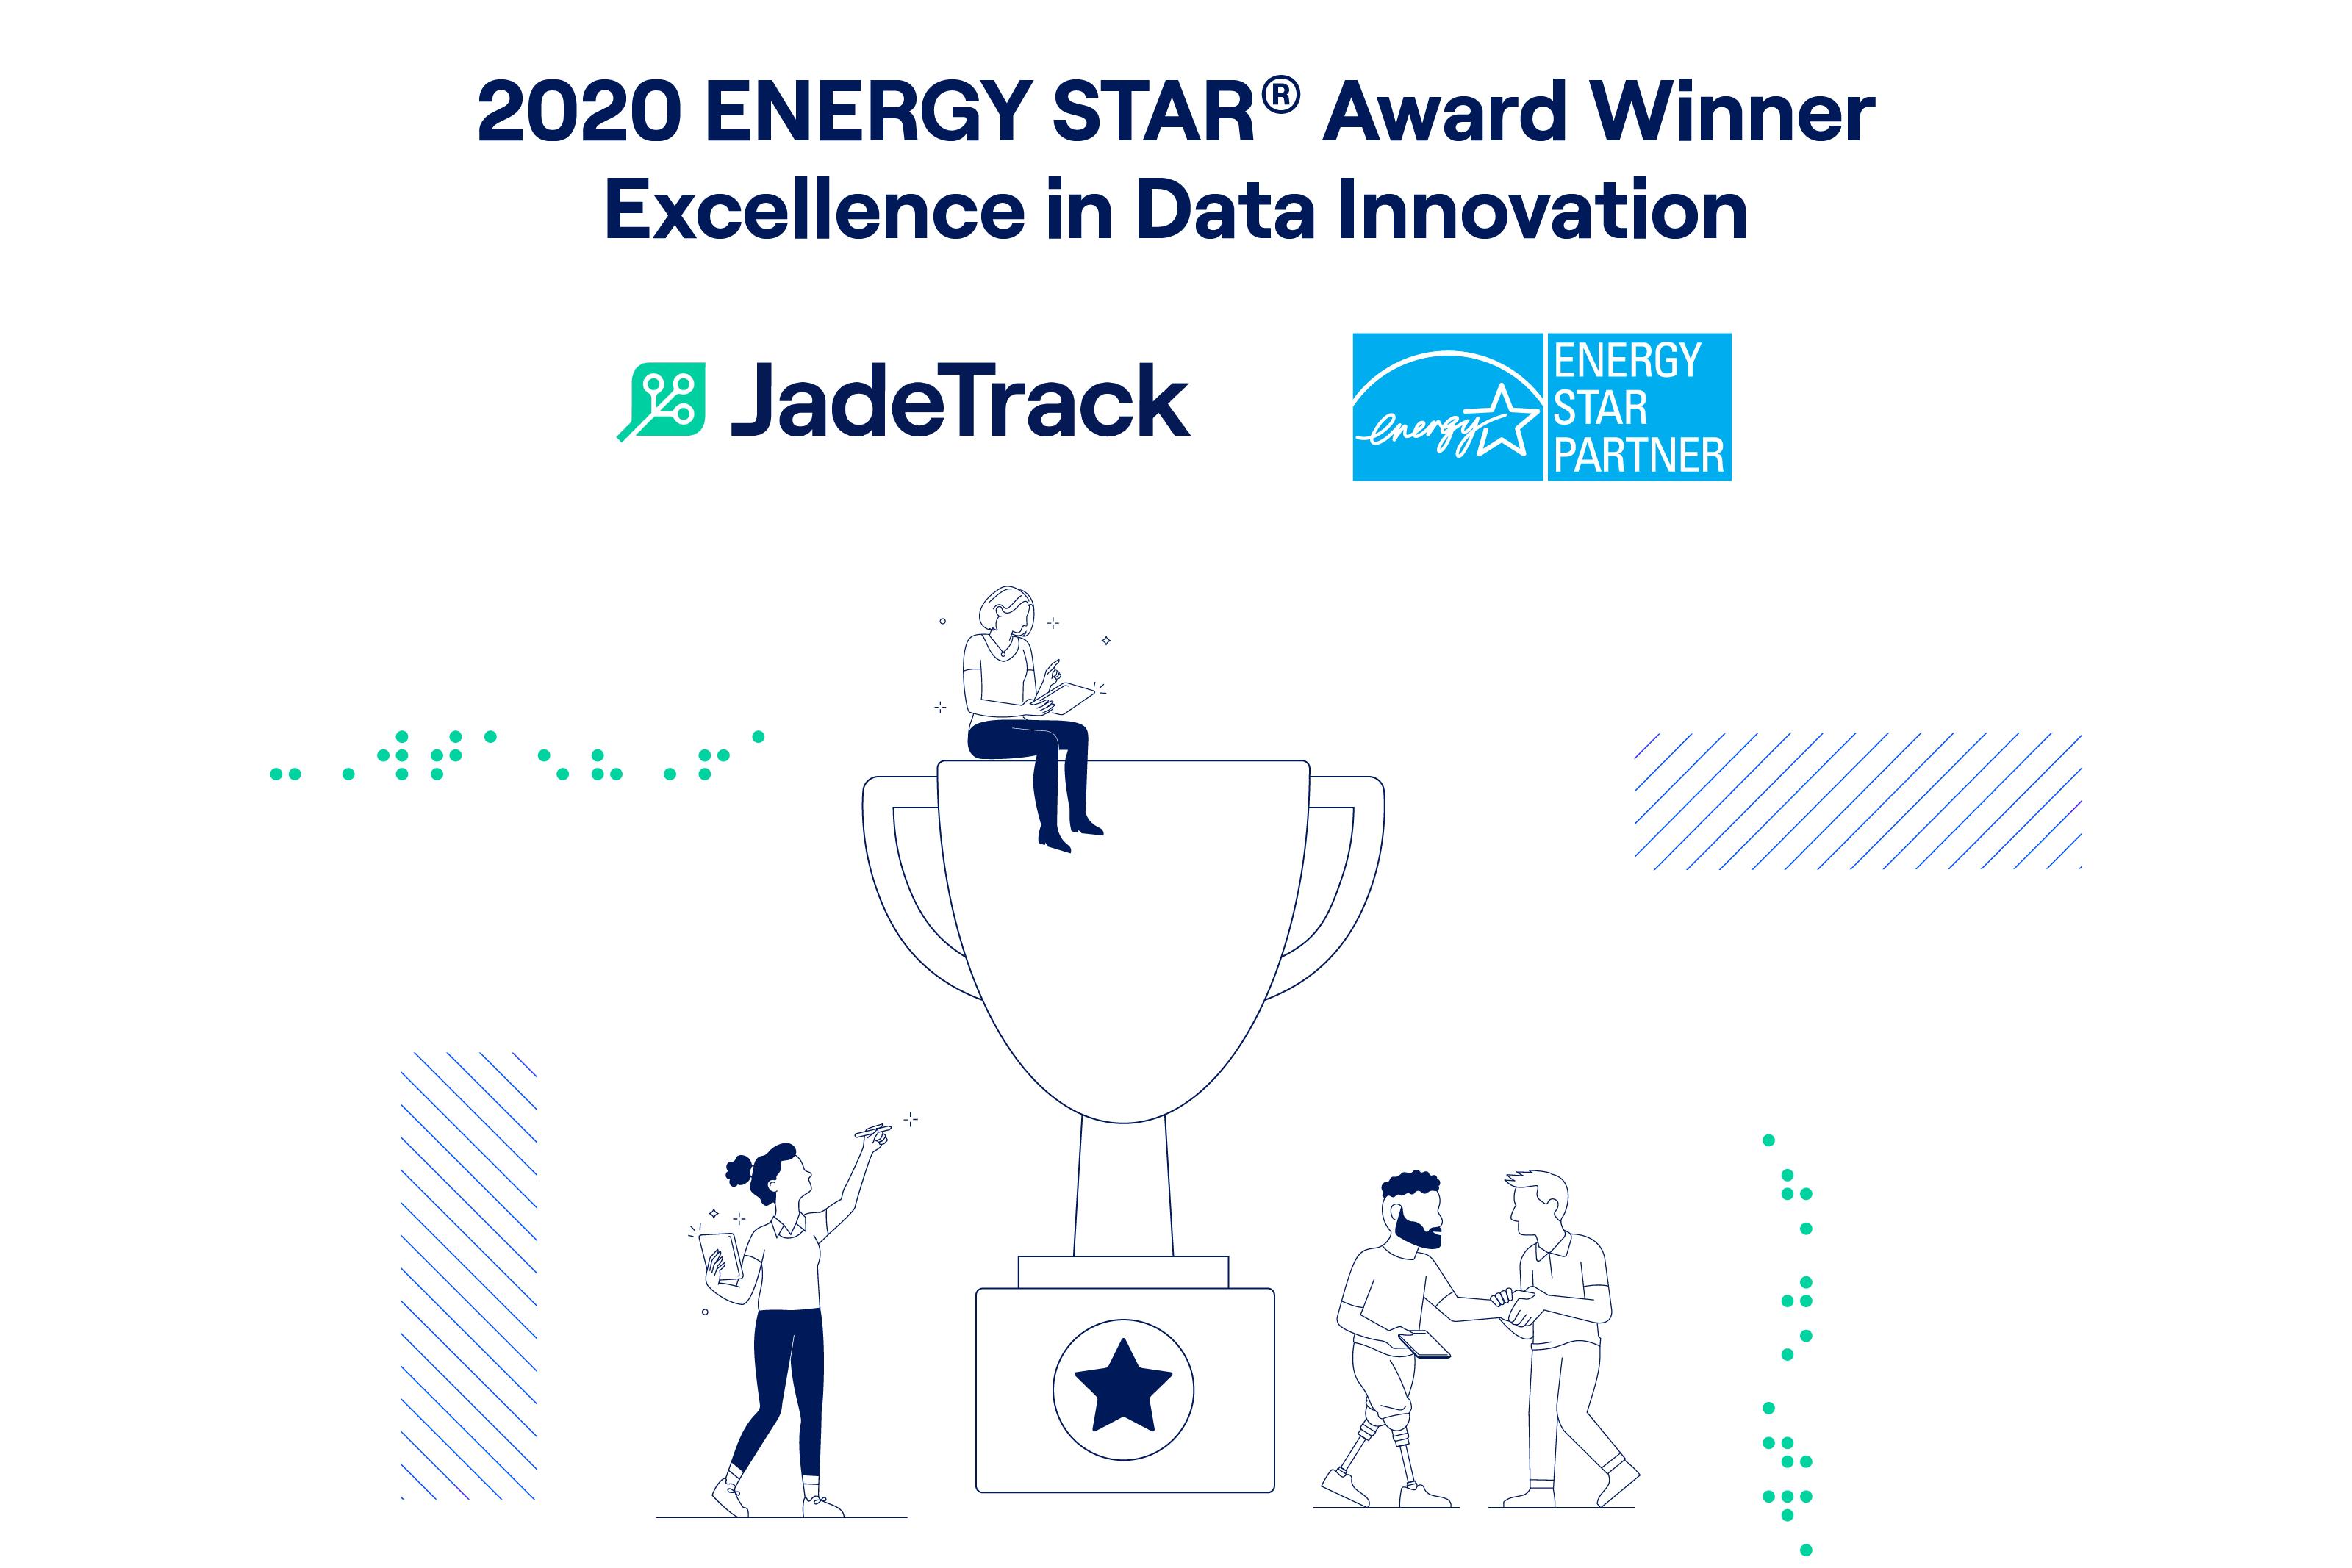 JadeTrack ENERGY STAR Award